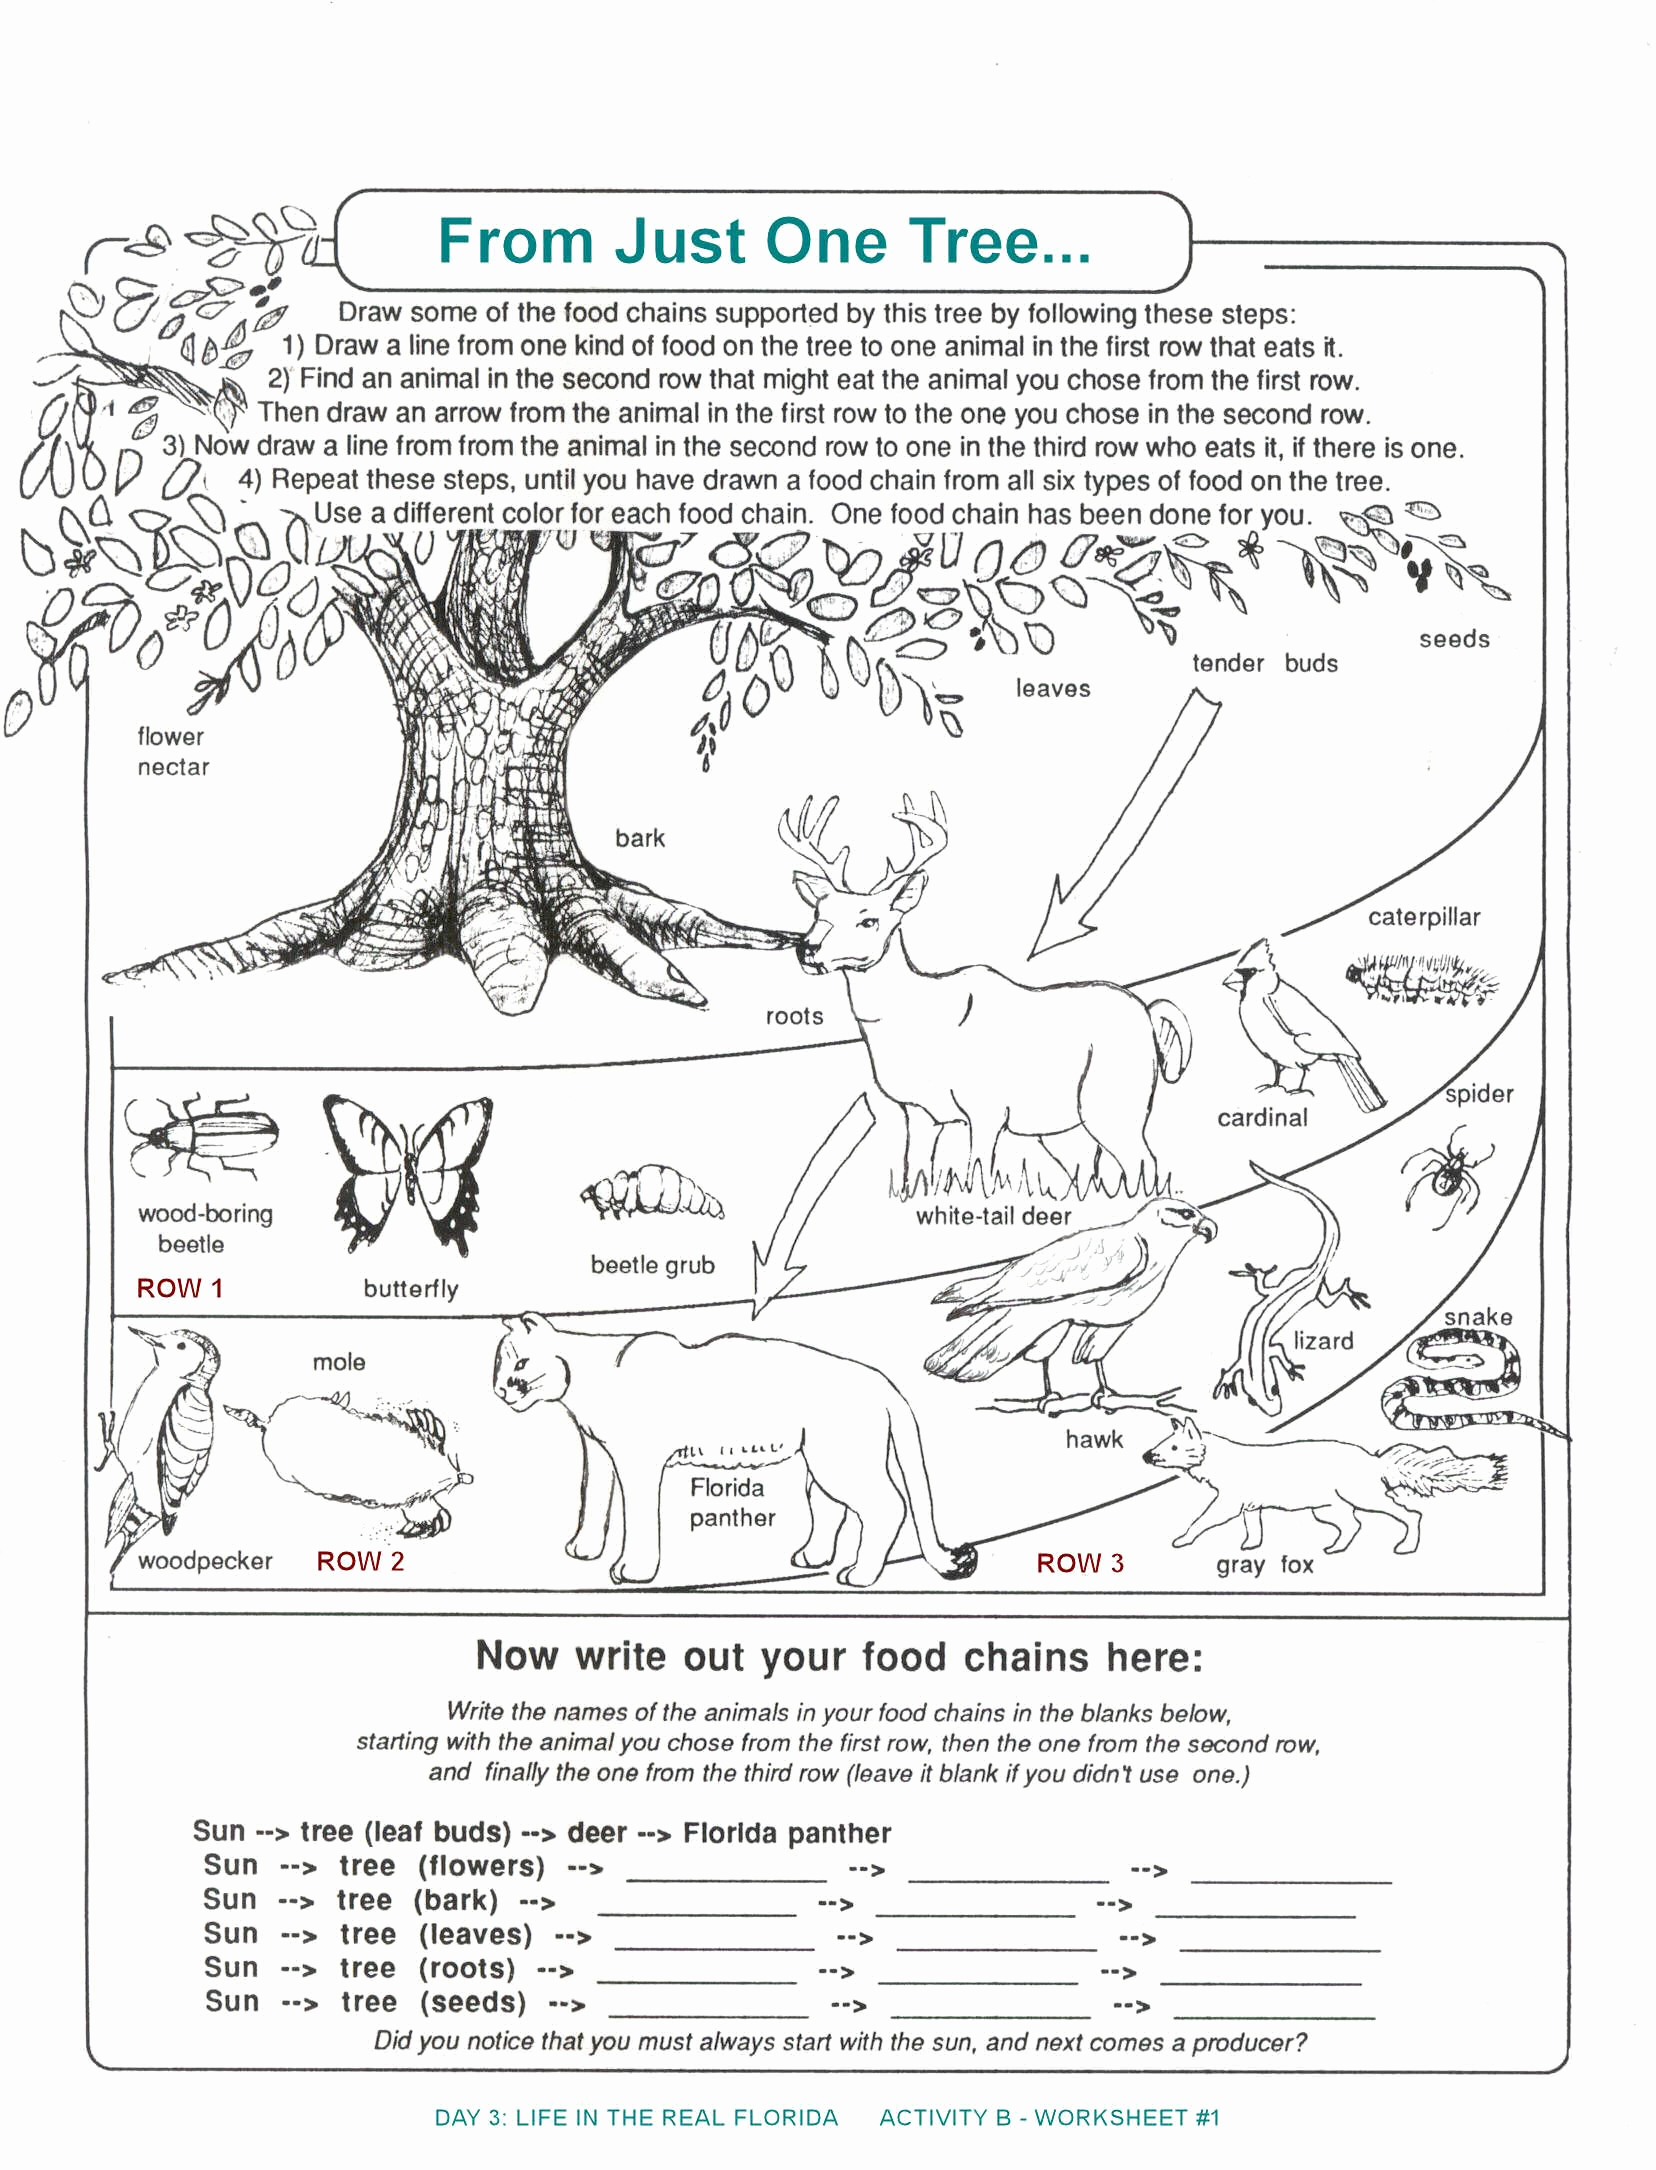 Middle School Science Worksheets Pdf Best Of 20 Middle School Science Worksheets Pdf